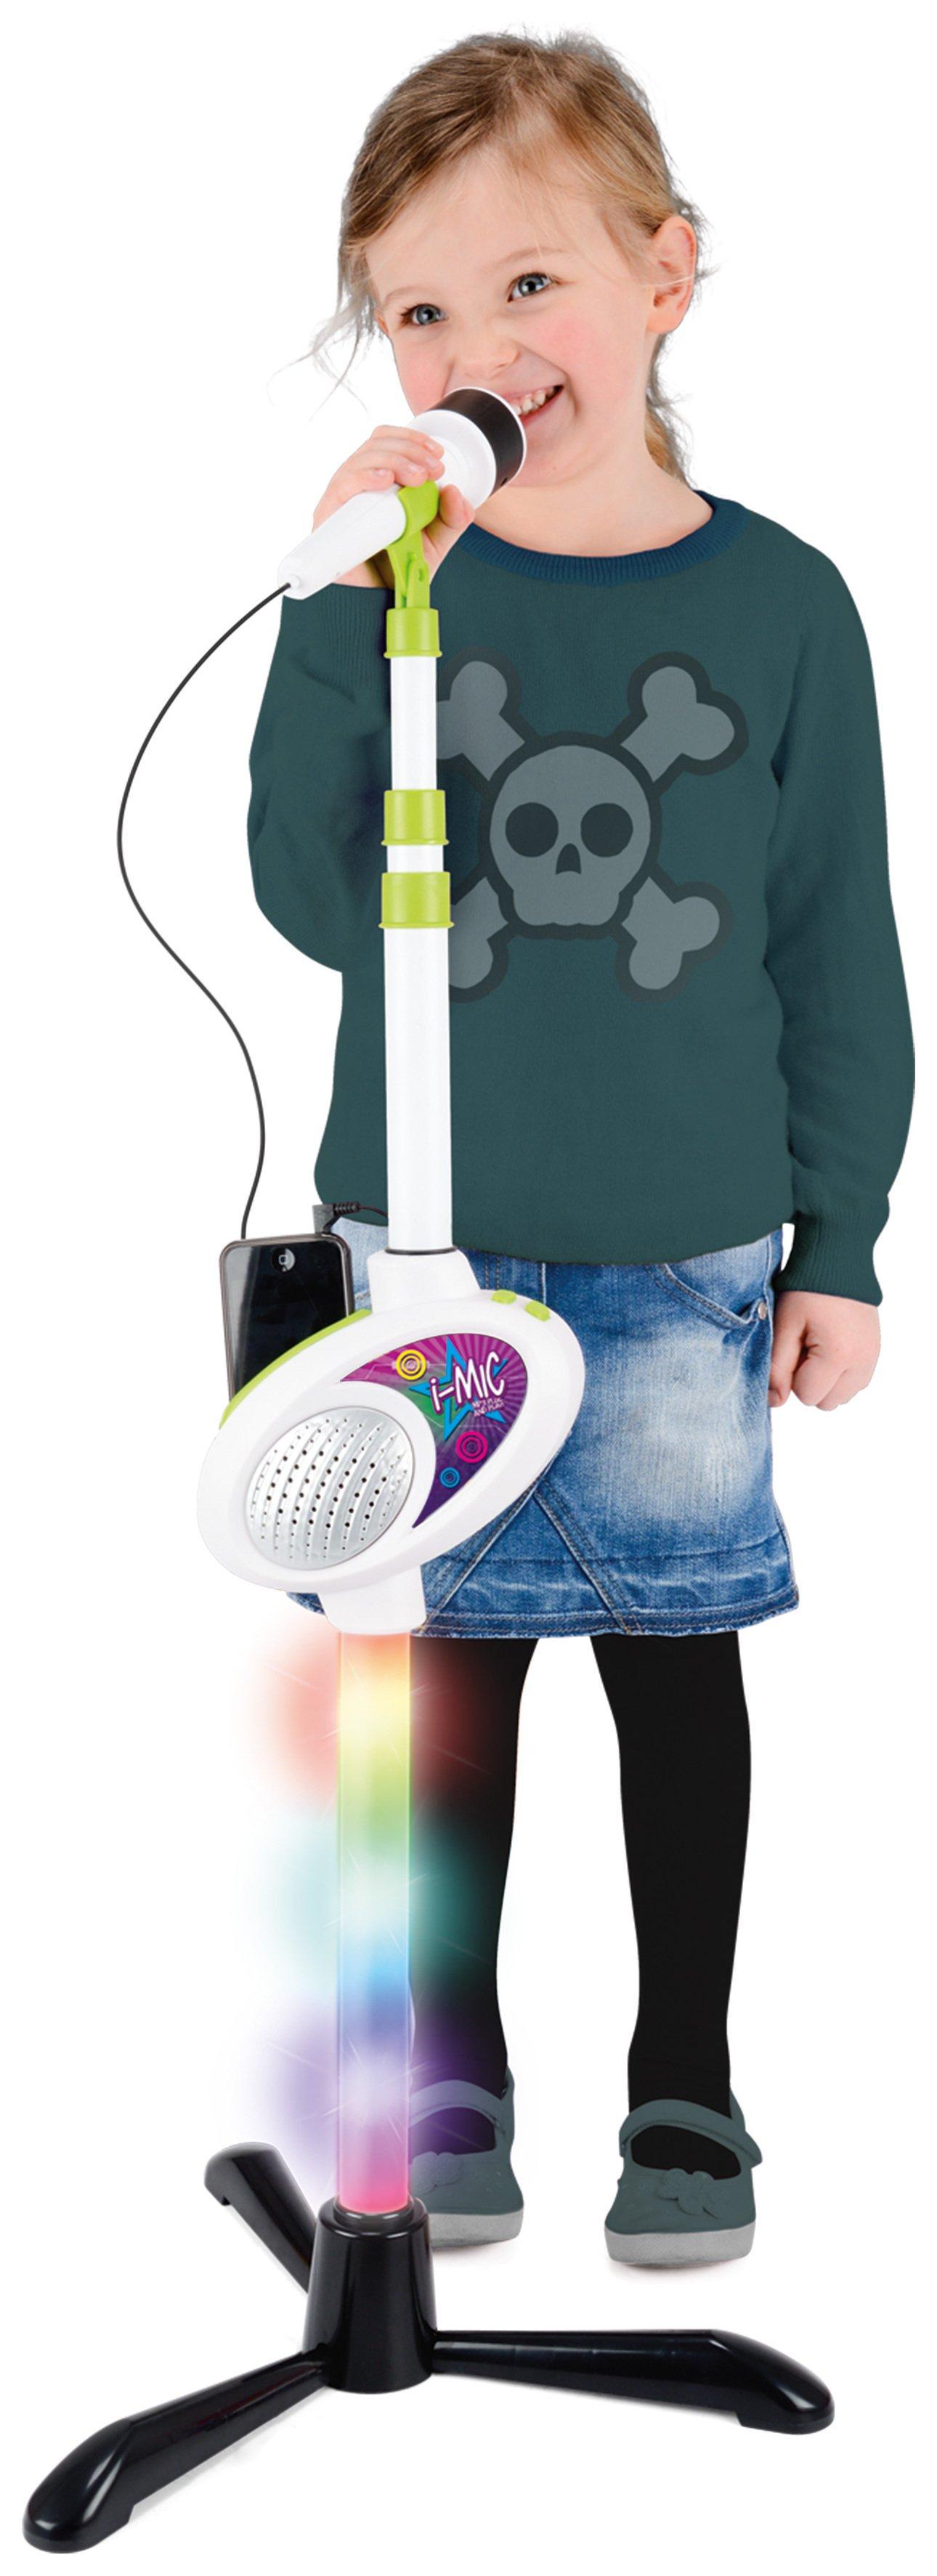 Image of Toyrific - I Microphone